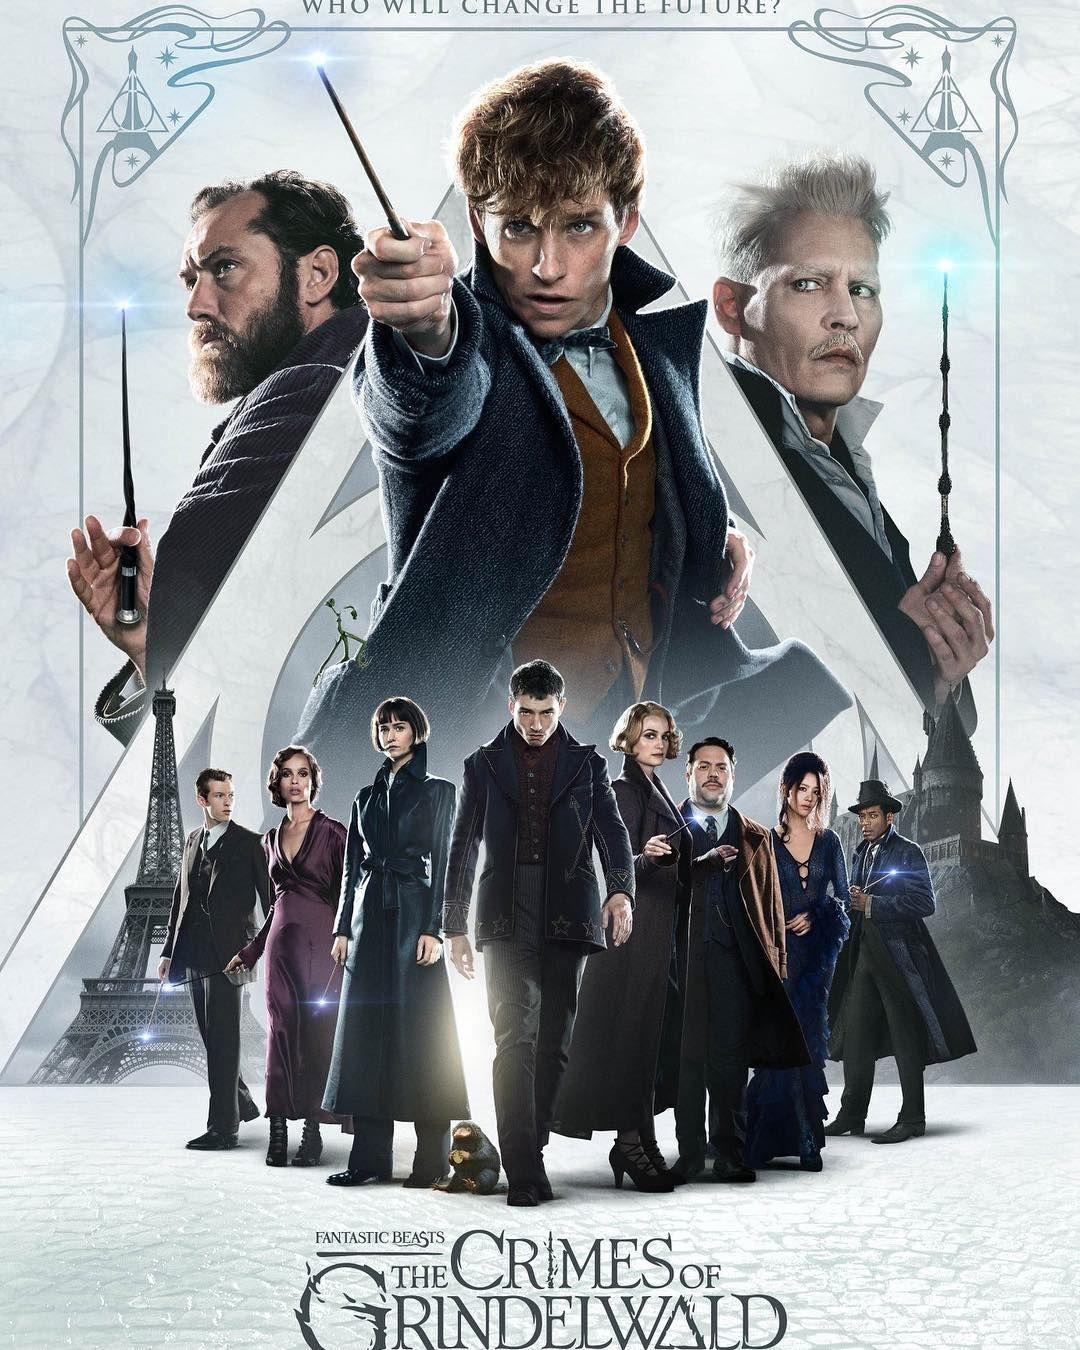 Fantastic Beasts Crimes Of Grindelwald With Images Fantastic